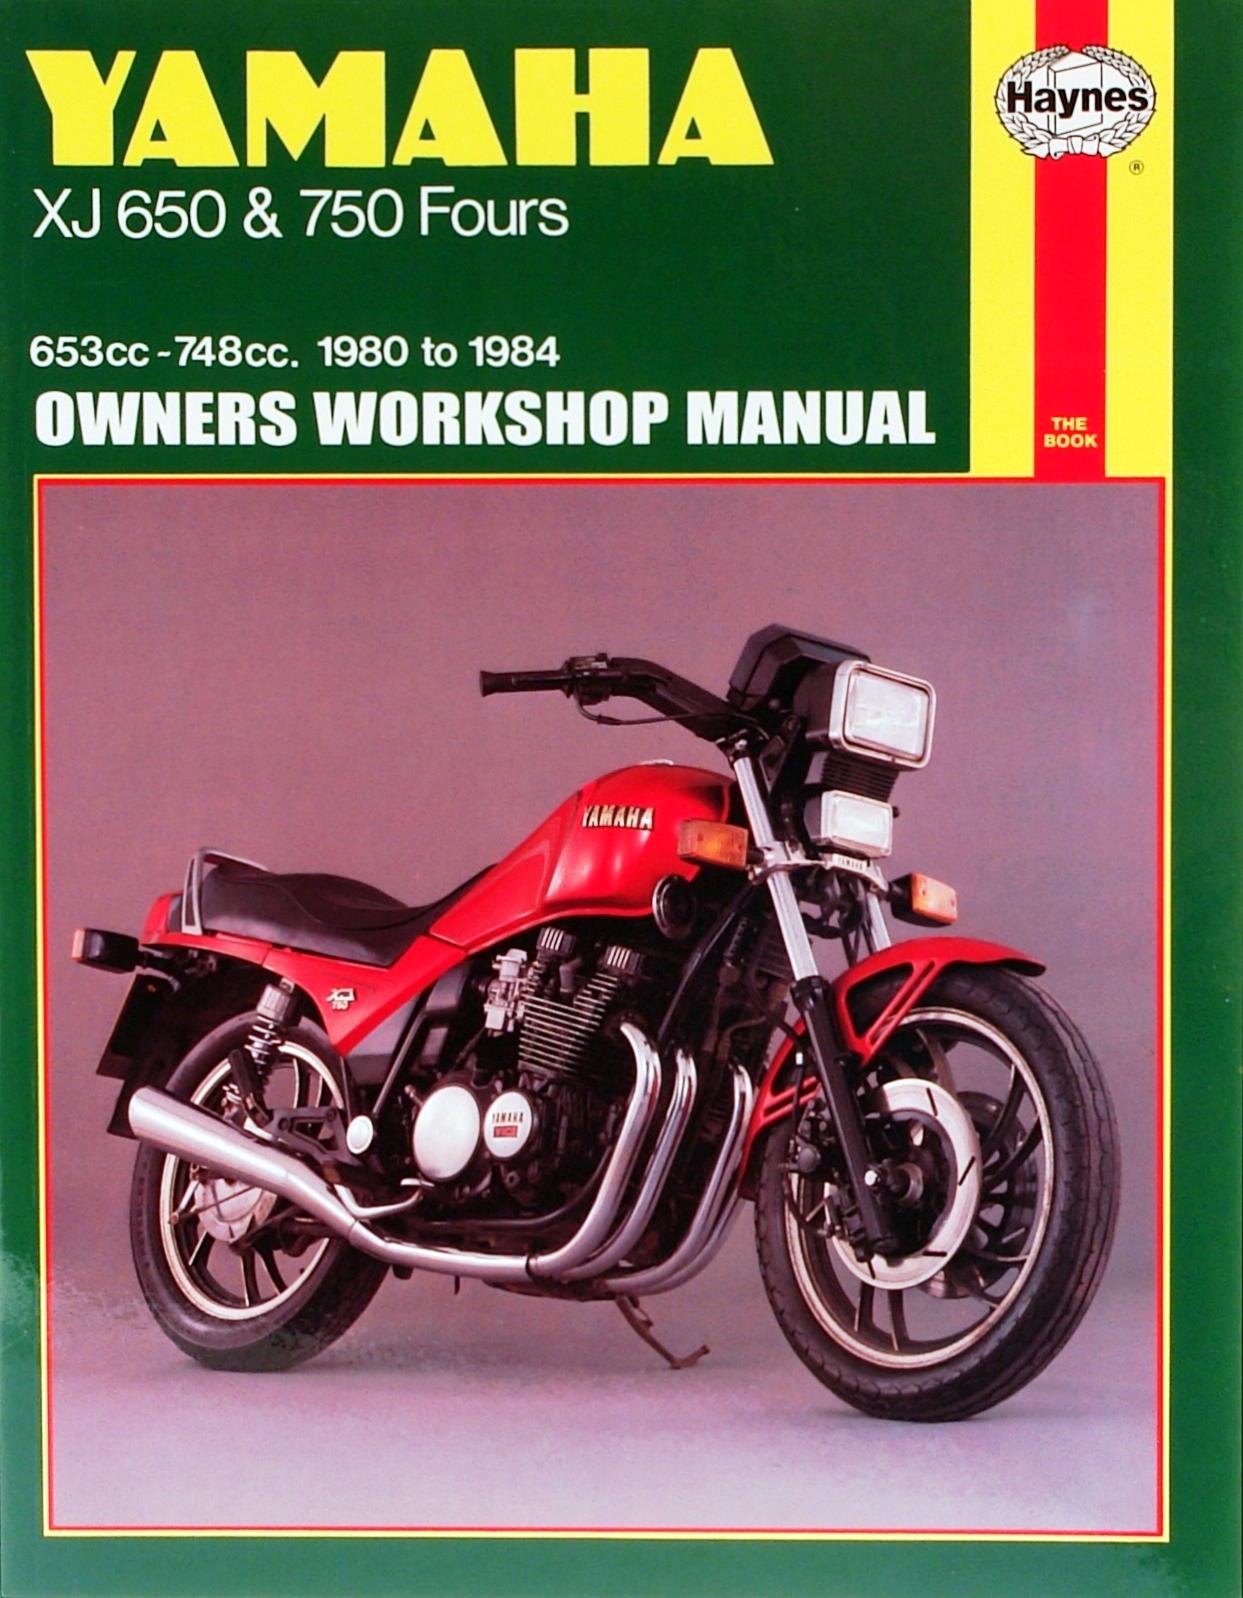 seca model 700 service manual